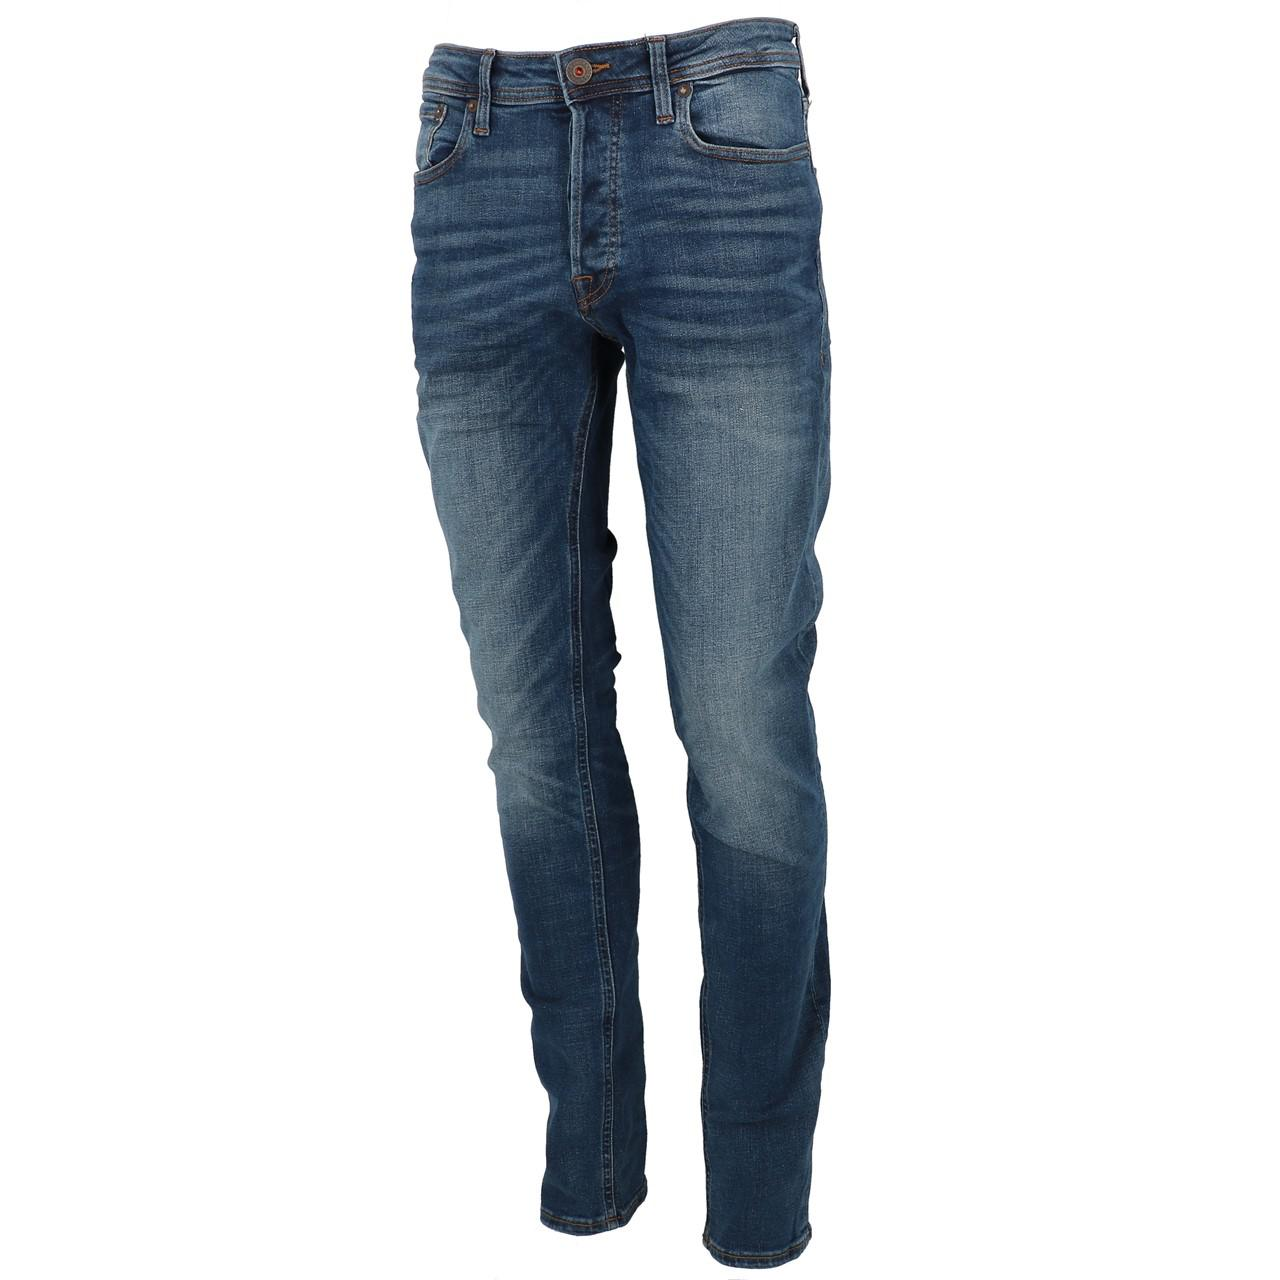 Jeans-Pants-Jack-and-jones-Tim-34-Blue-Denim-Blue-Jeans-19918-New